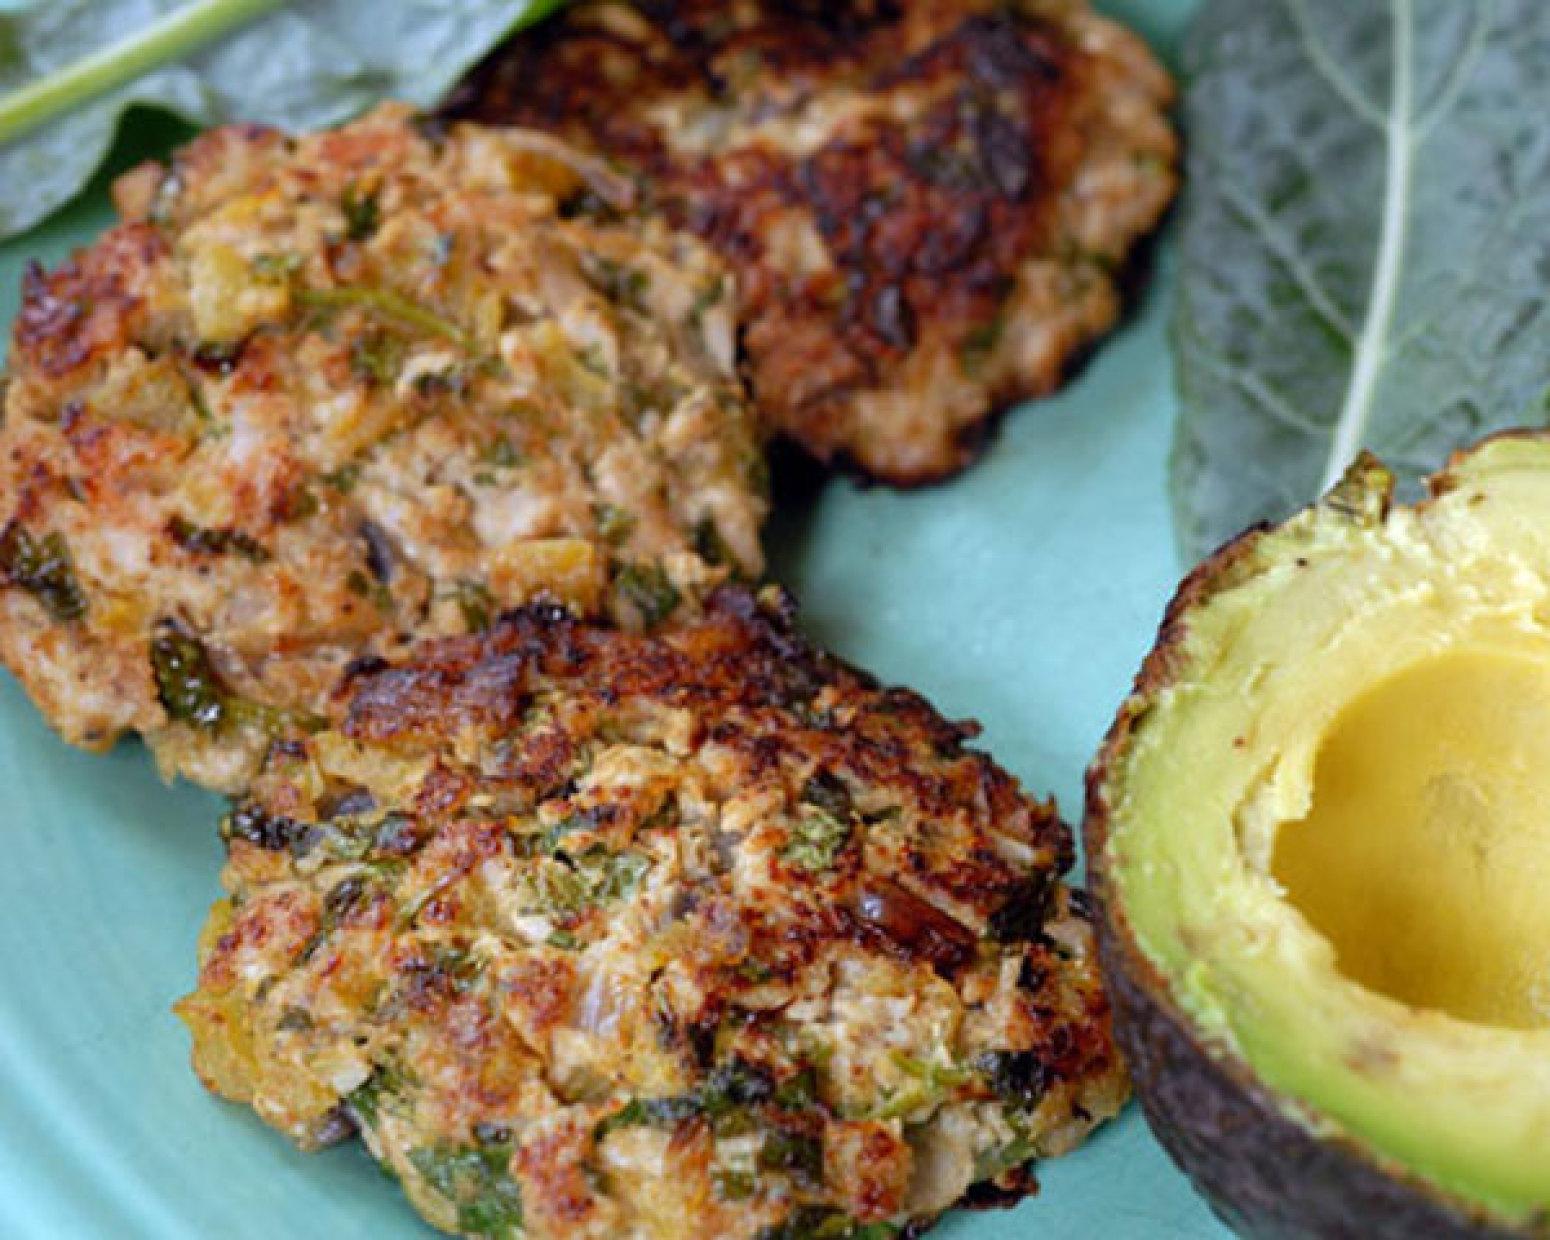 Green Chile Turkey Burgers Recipe 2 | Just A Pinch Recipes